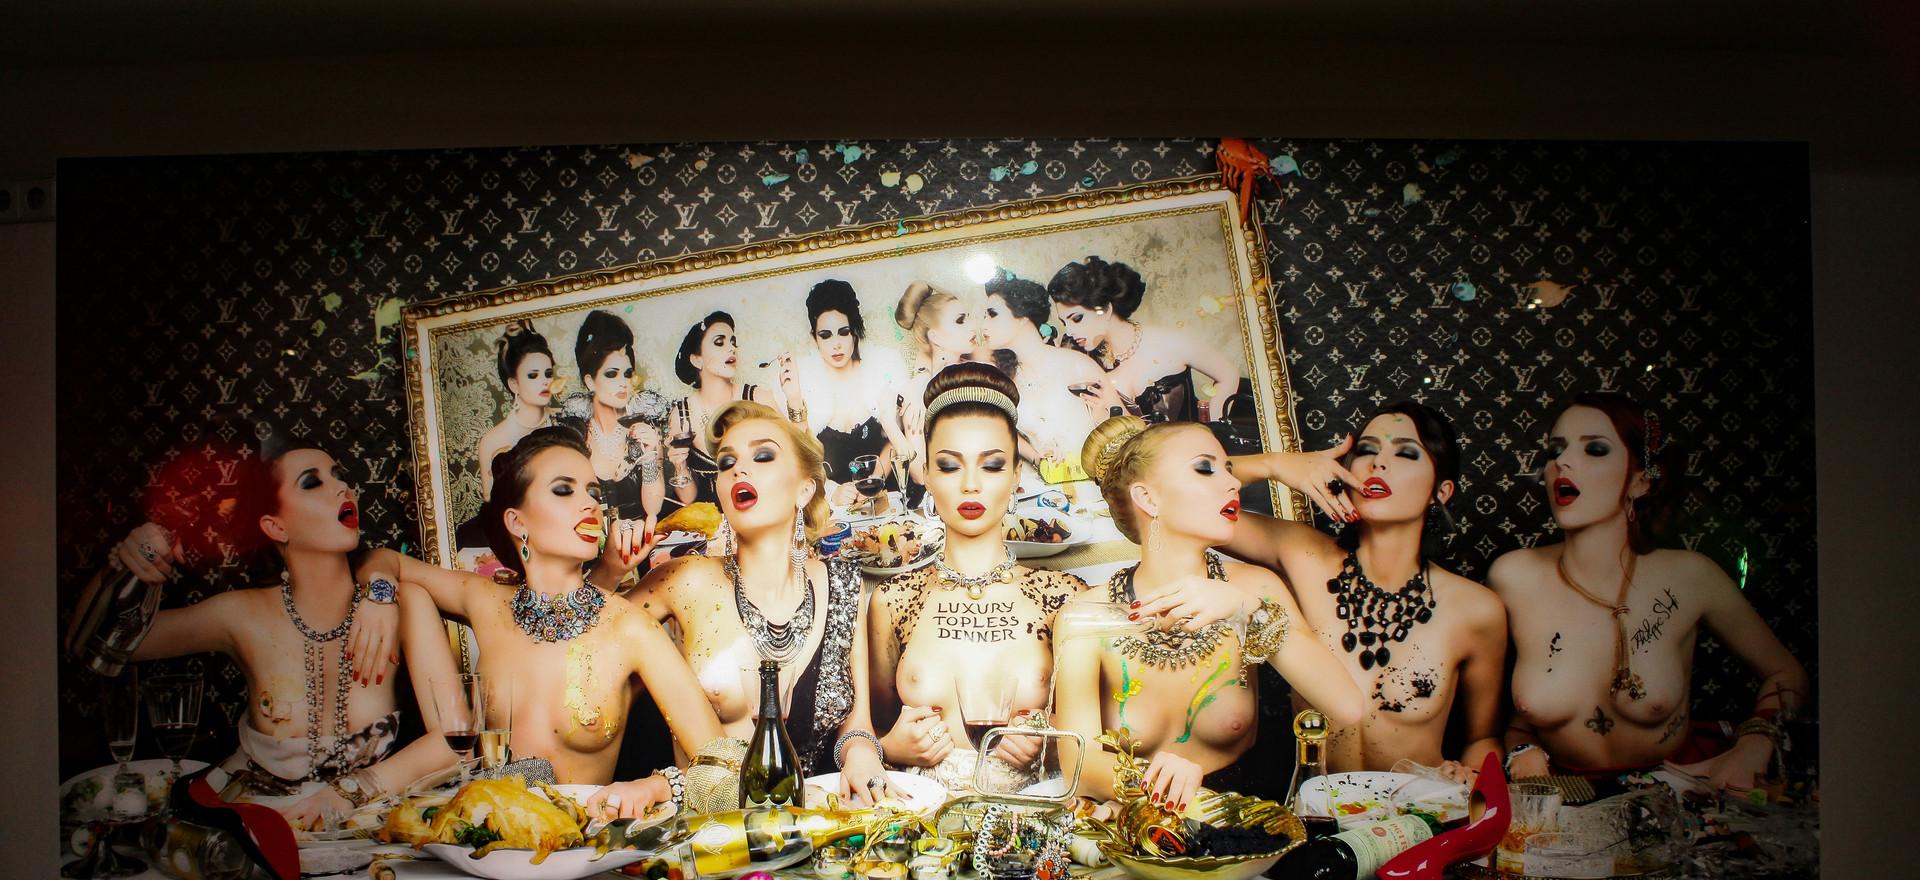 Luxury Topless Dinner